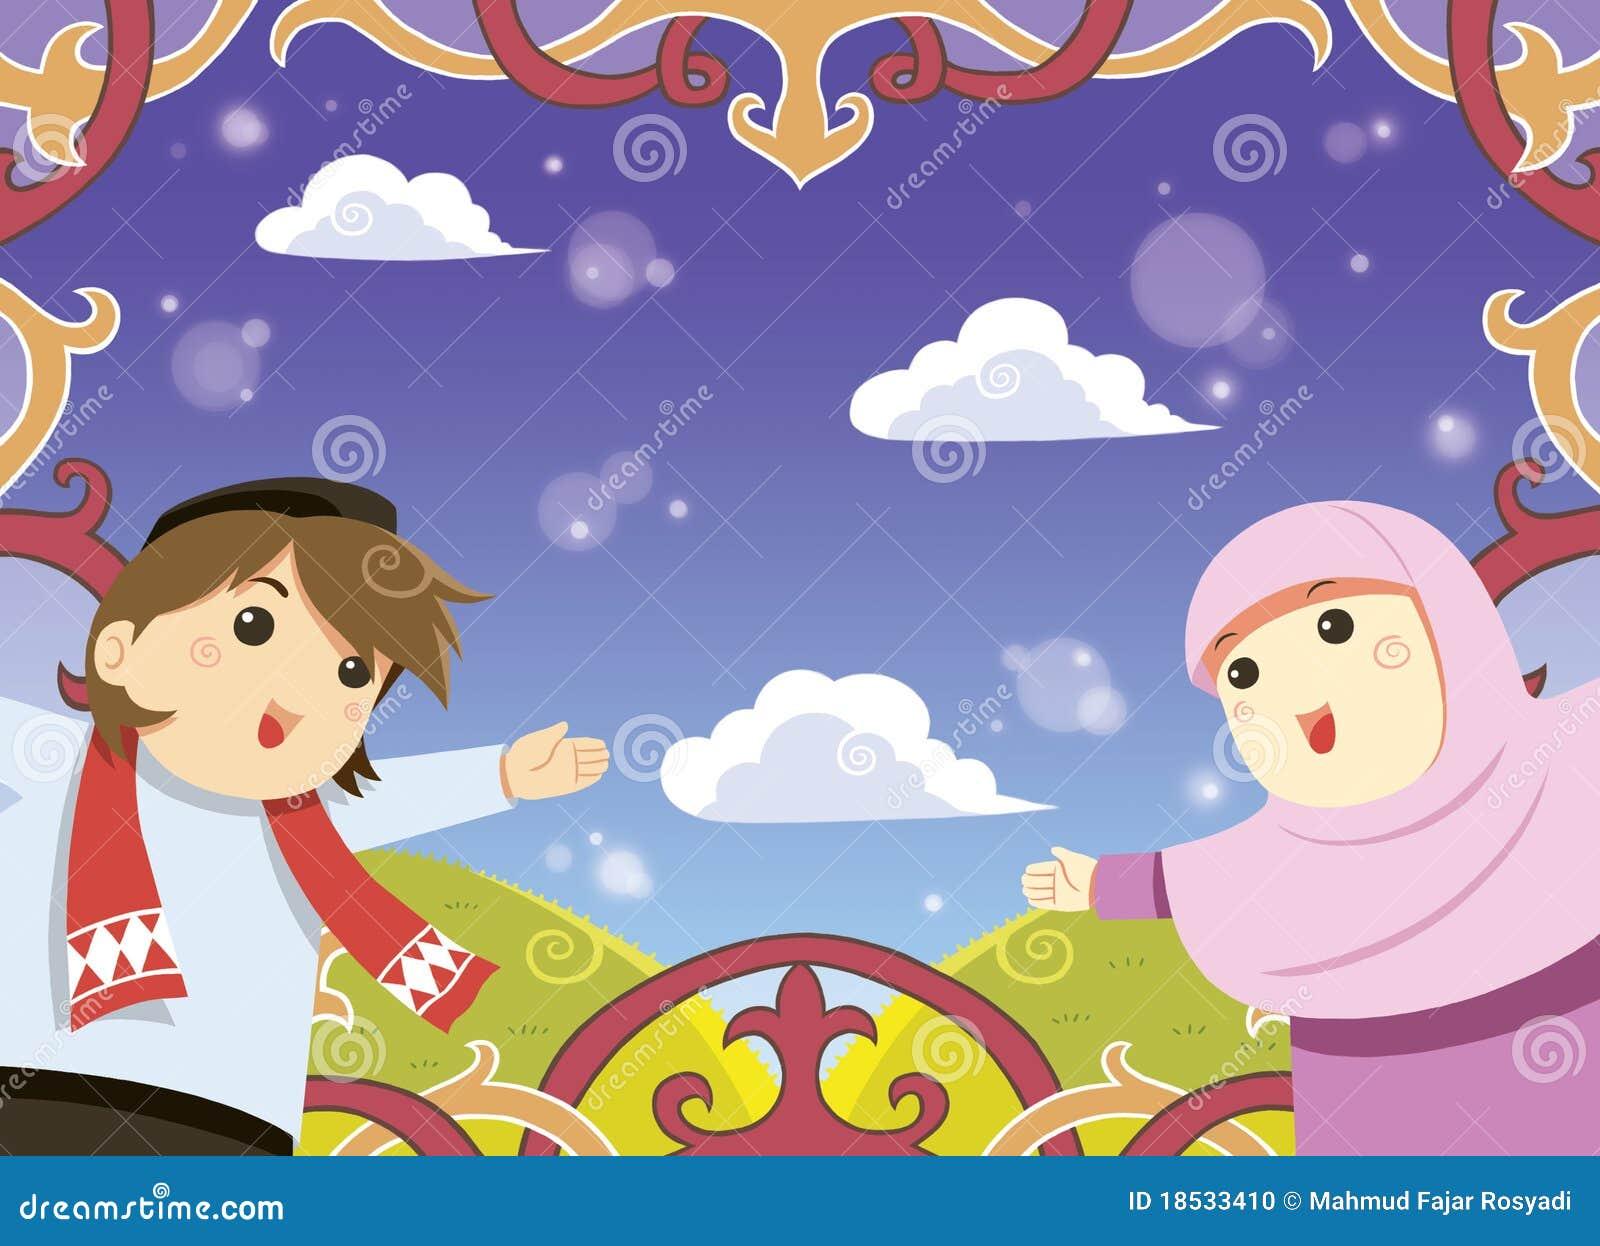 Muslim greeting card stock illustration illustration of happy muslim greeting card m4hsunfo